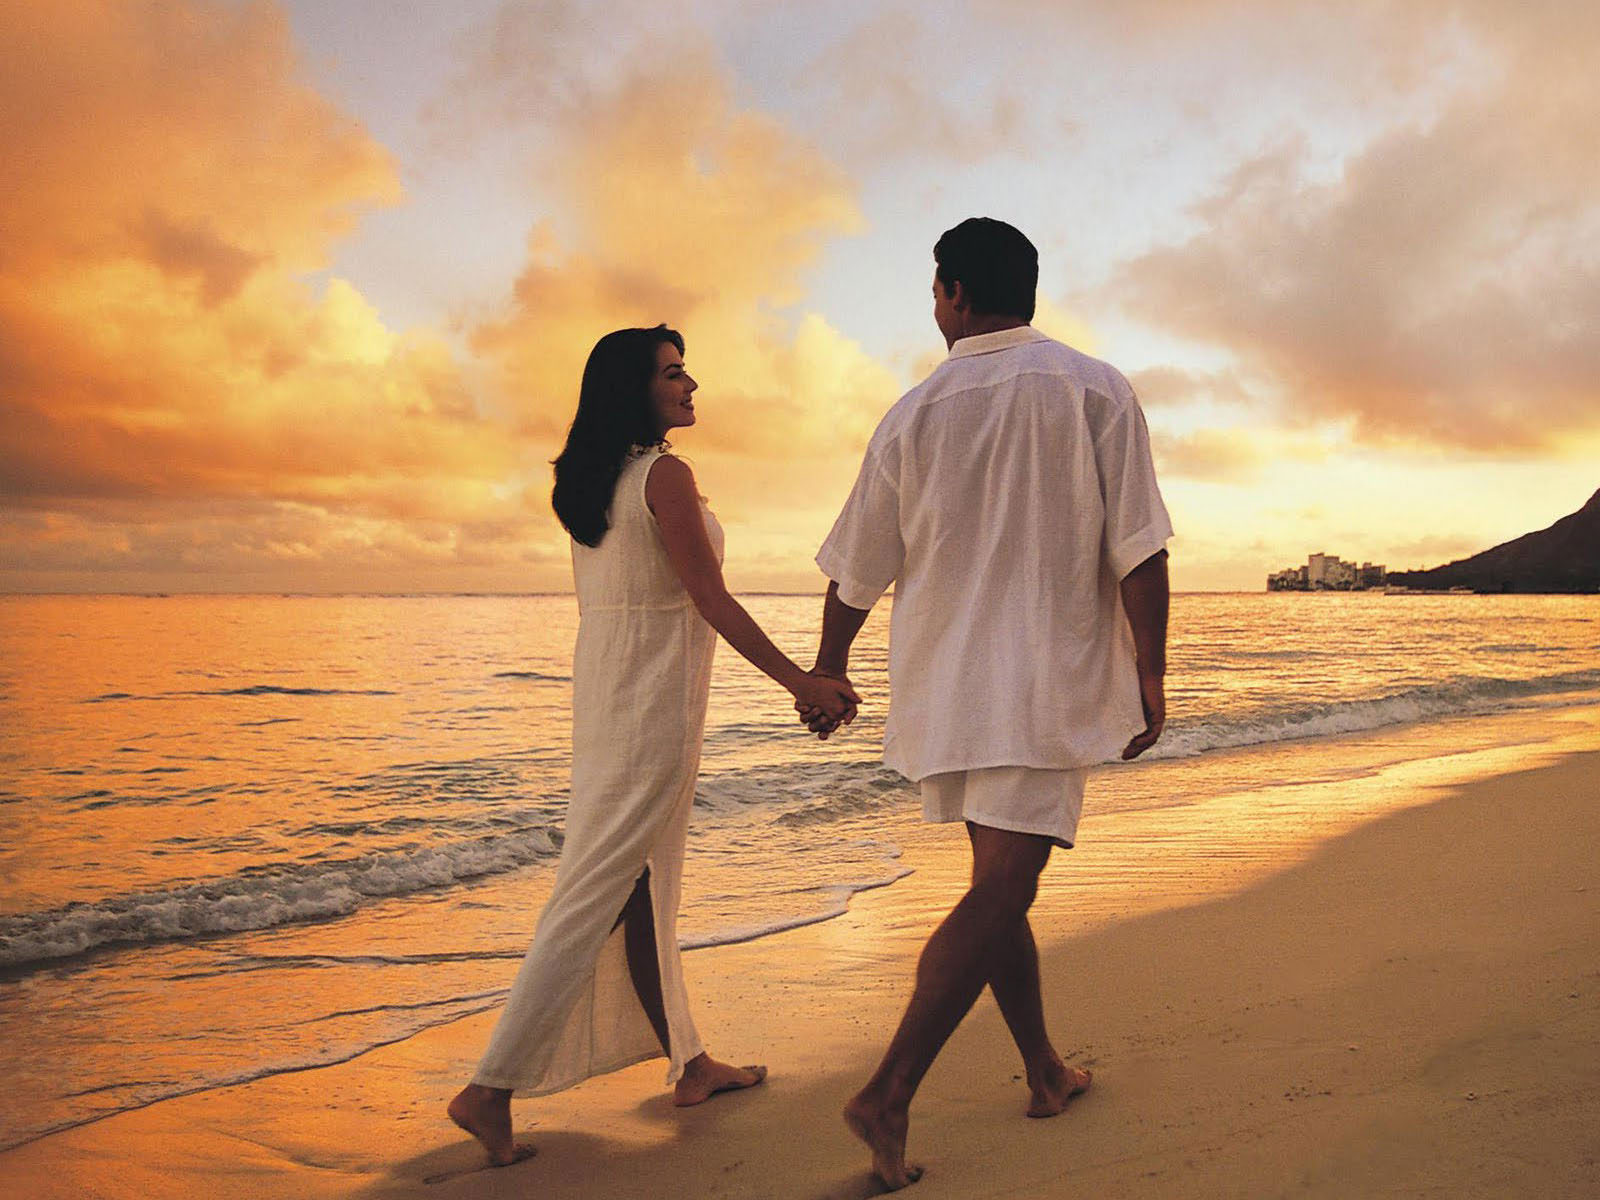 Beach-Love-Wallpapers-2